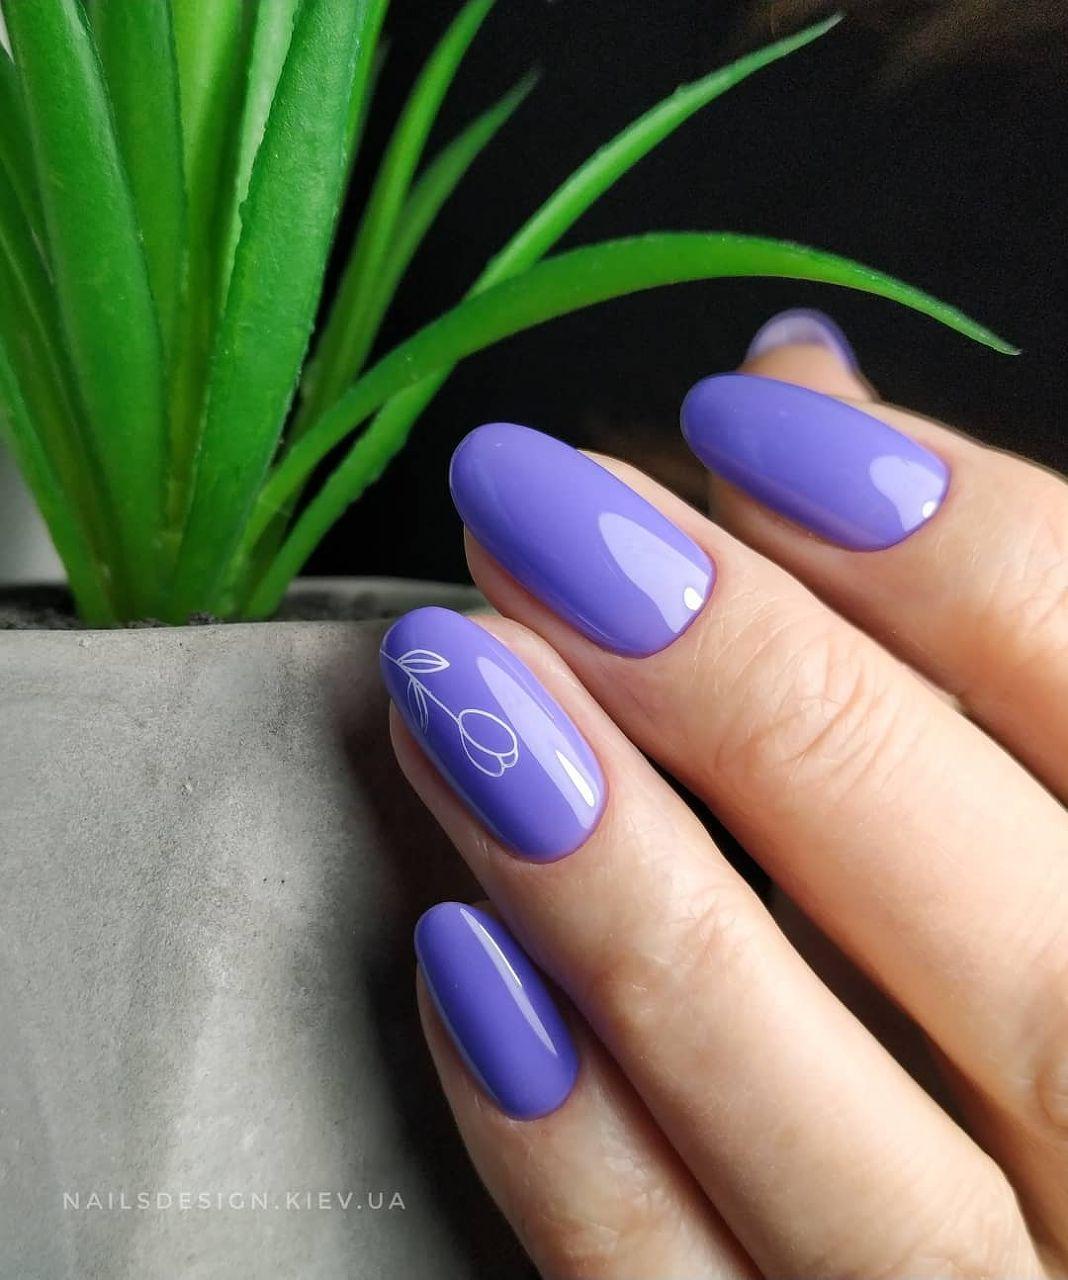 Photo 2 of Nails Design Kiev